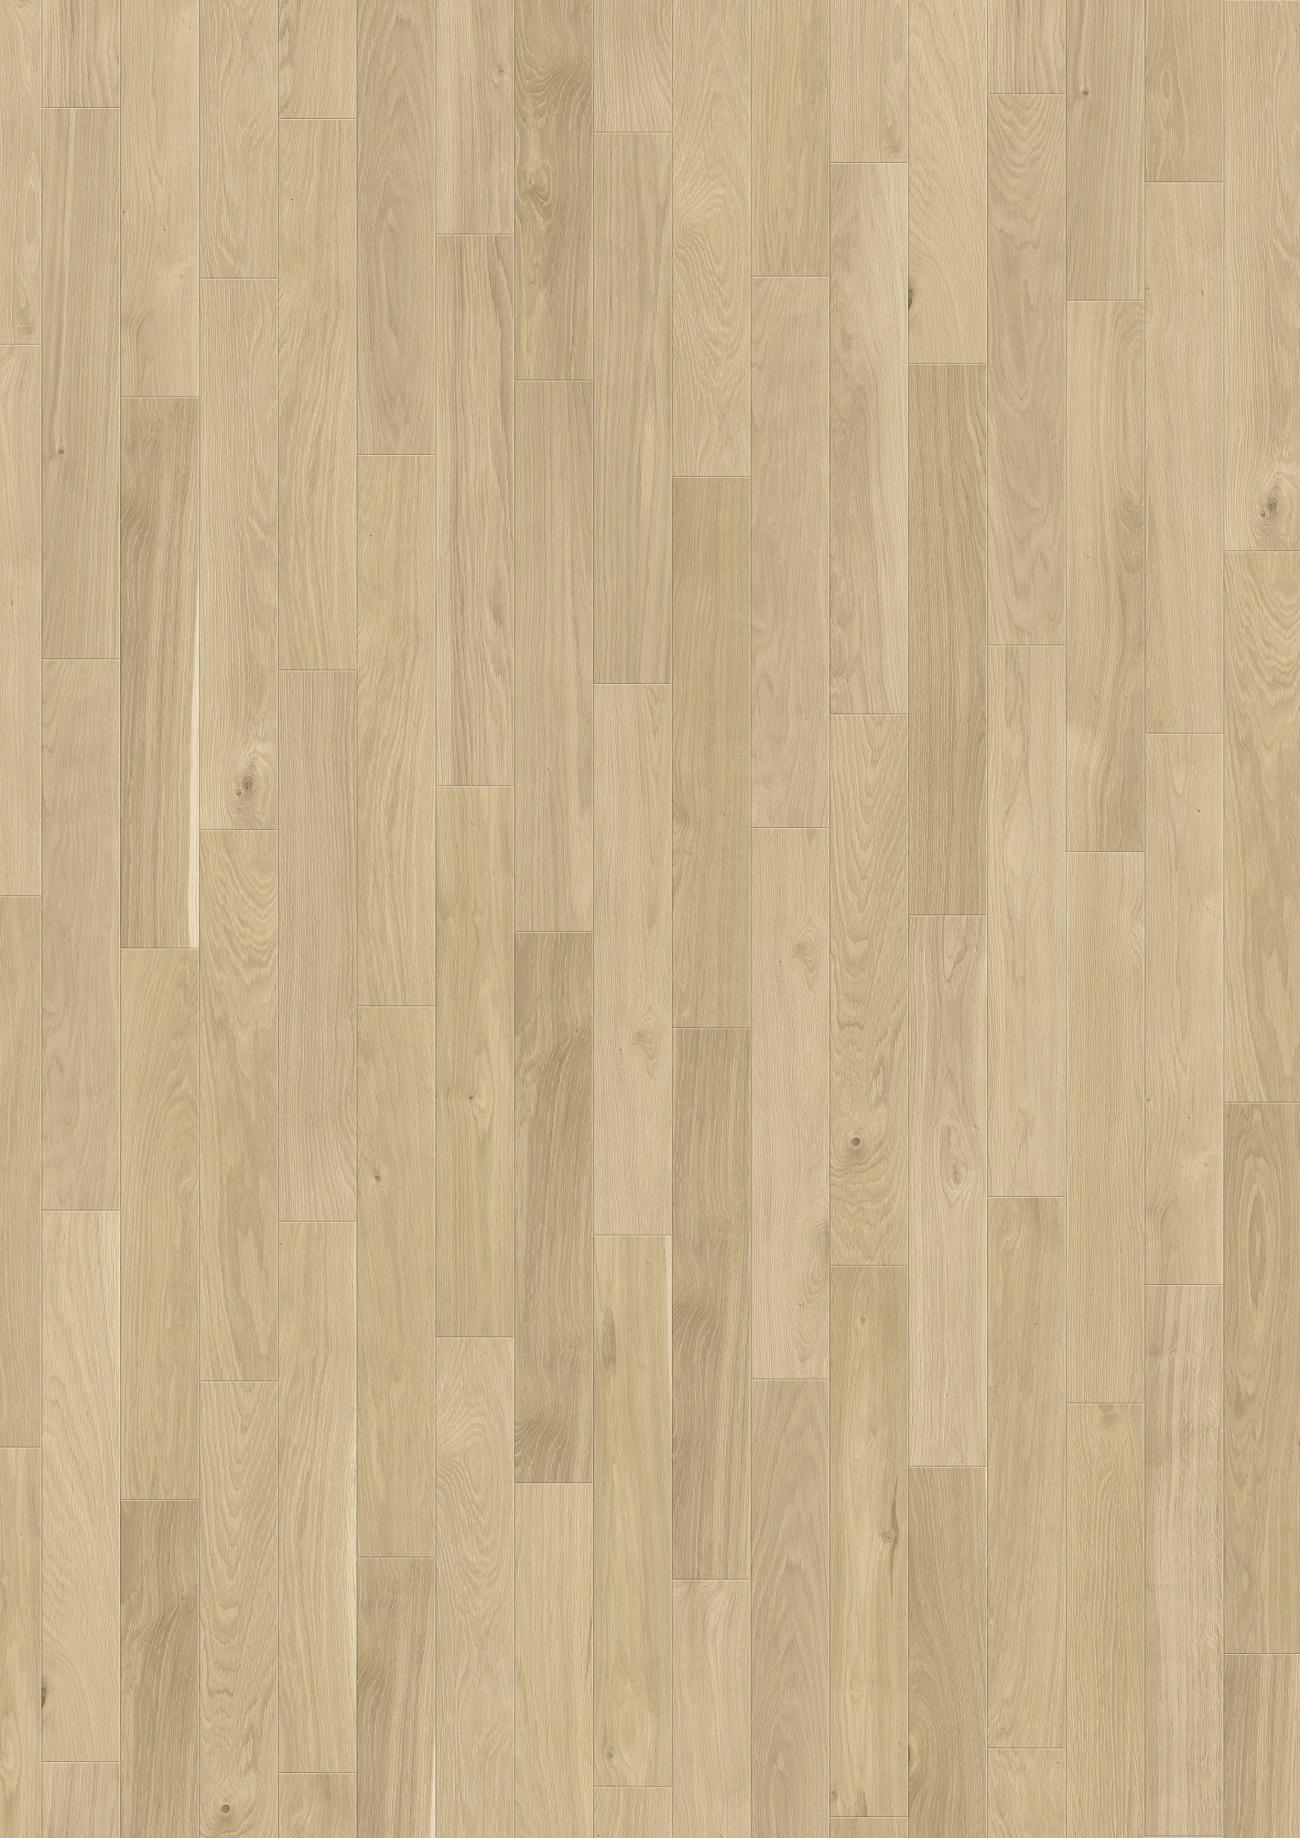 JOKA - Parkett Classic LOFT 140 VARIO Eiche gebürstet nova Nature 630 x 90 x 9,5mm